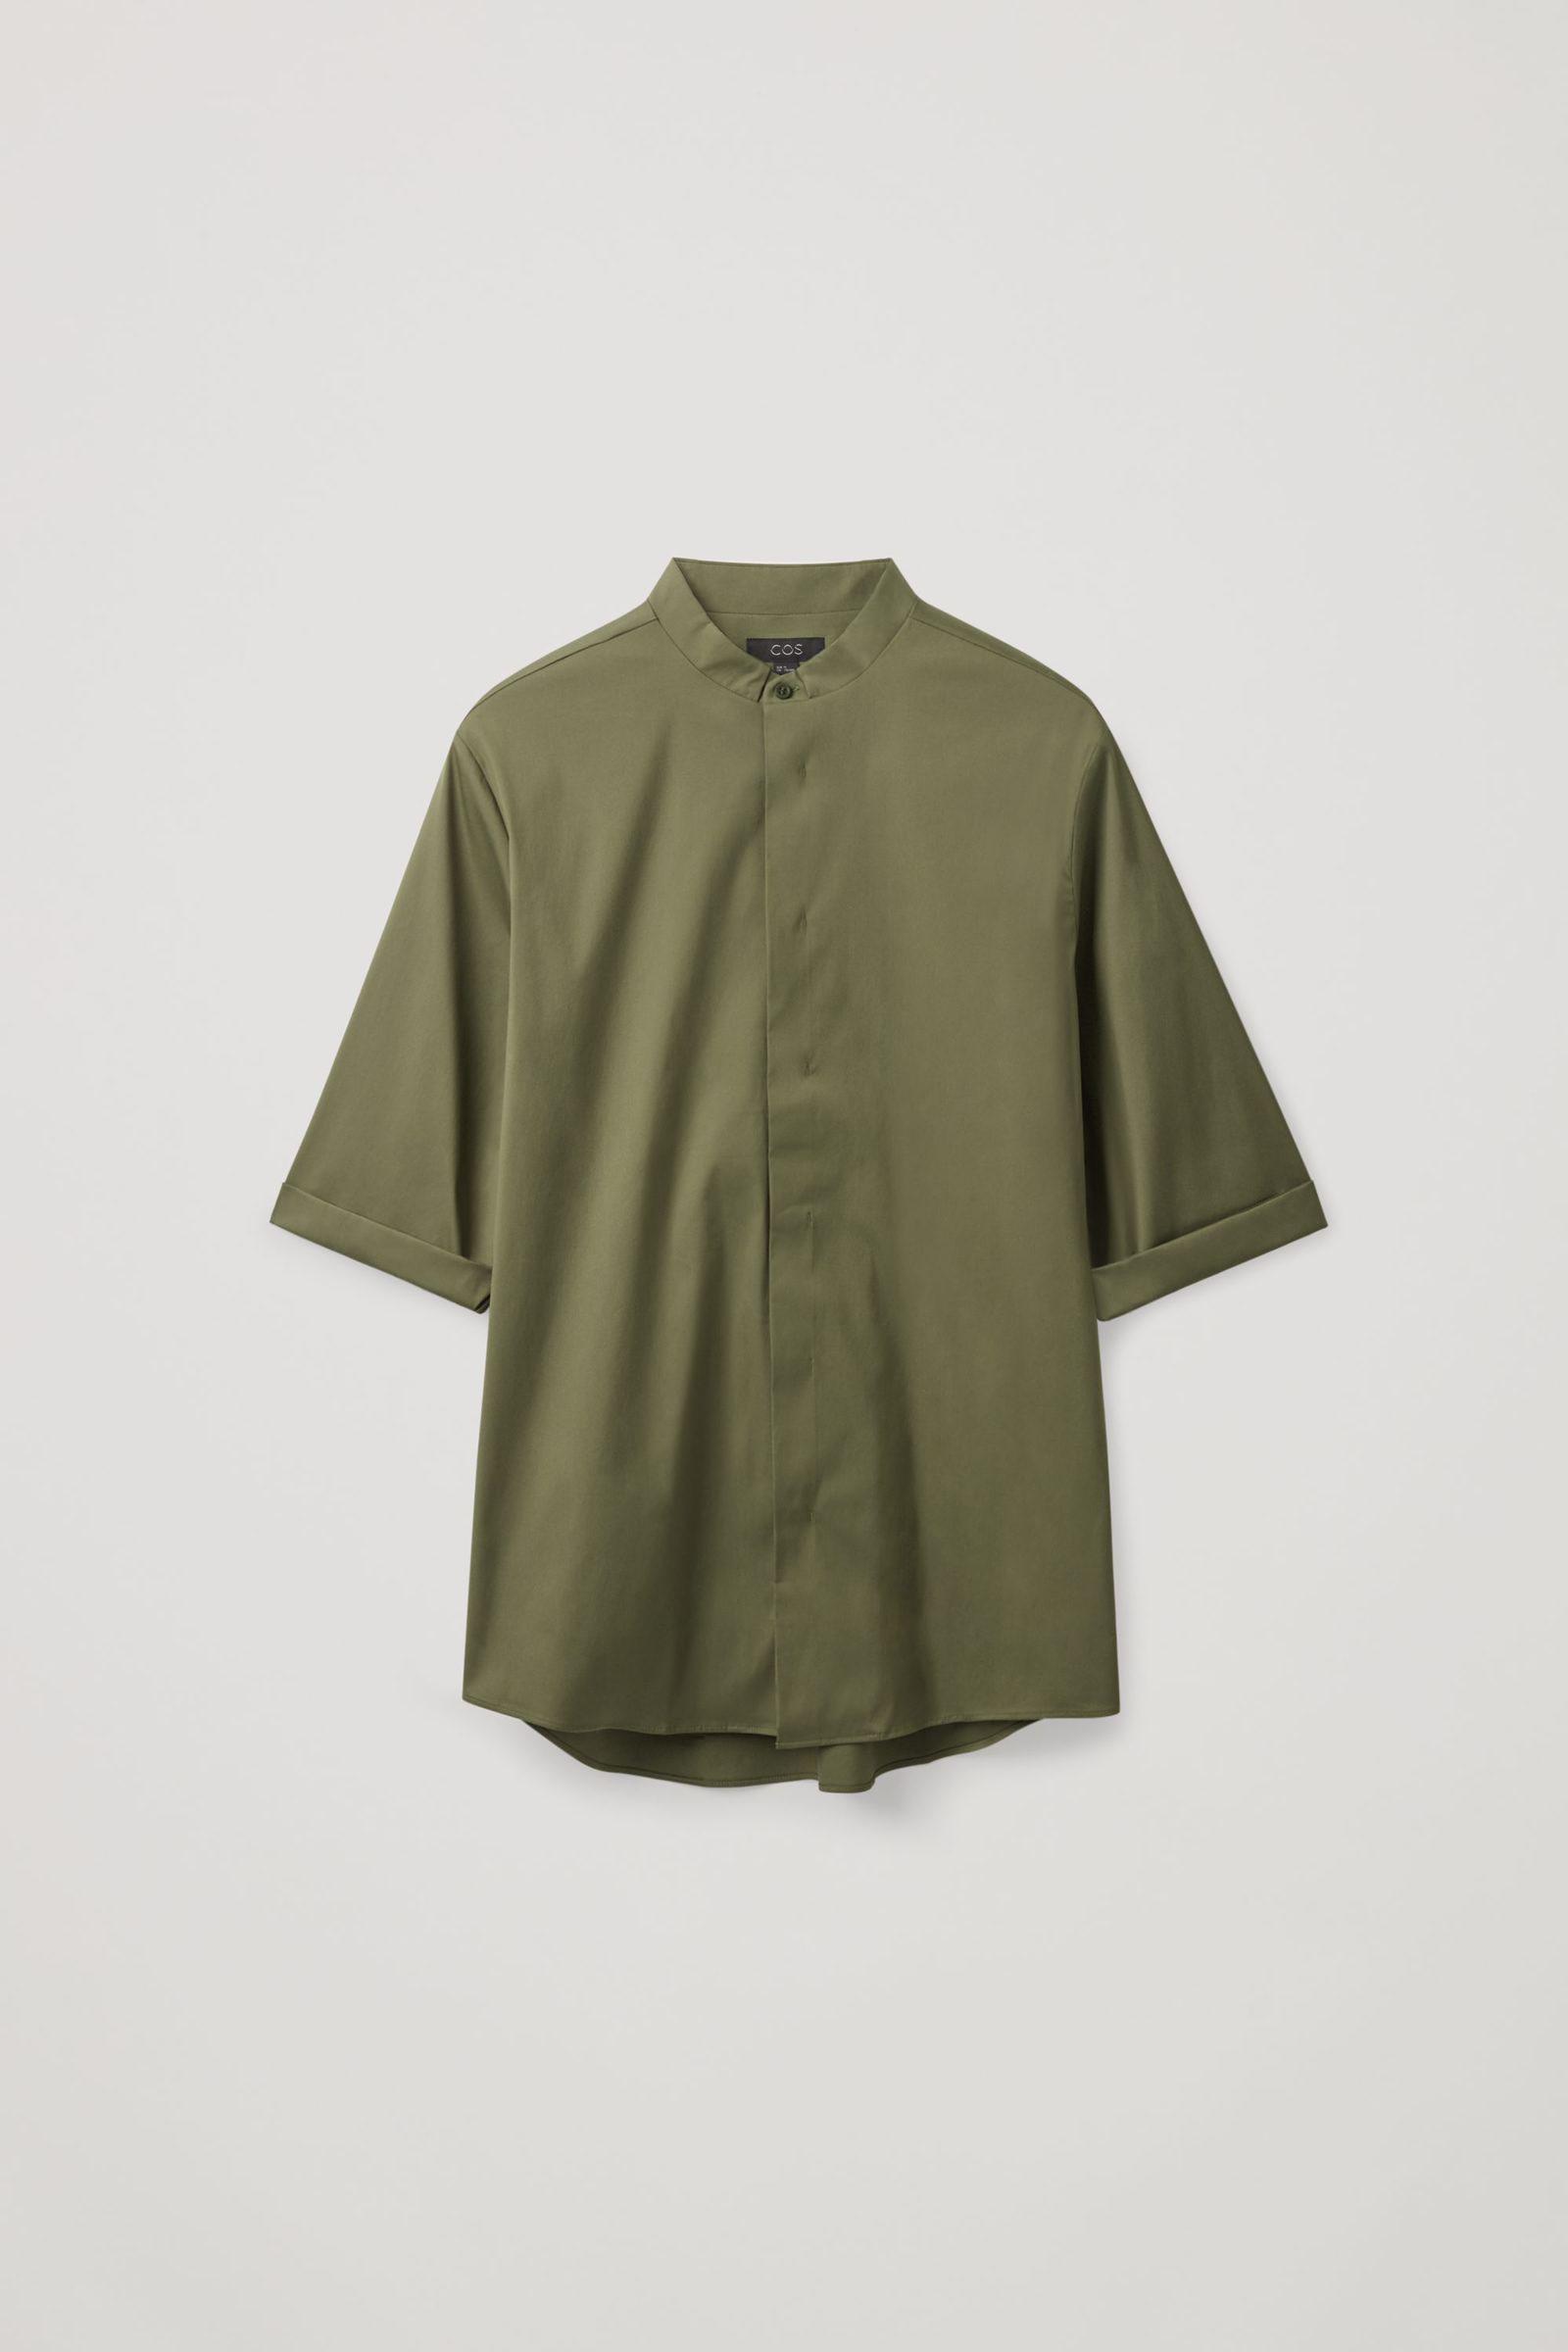 COS 슬림 칼라리스 셔츠의 카키컬러 Product입니다.